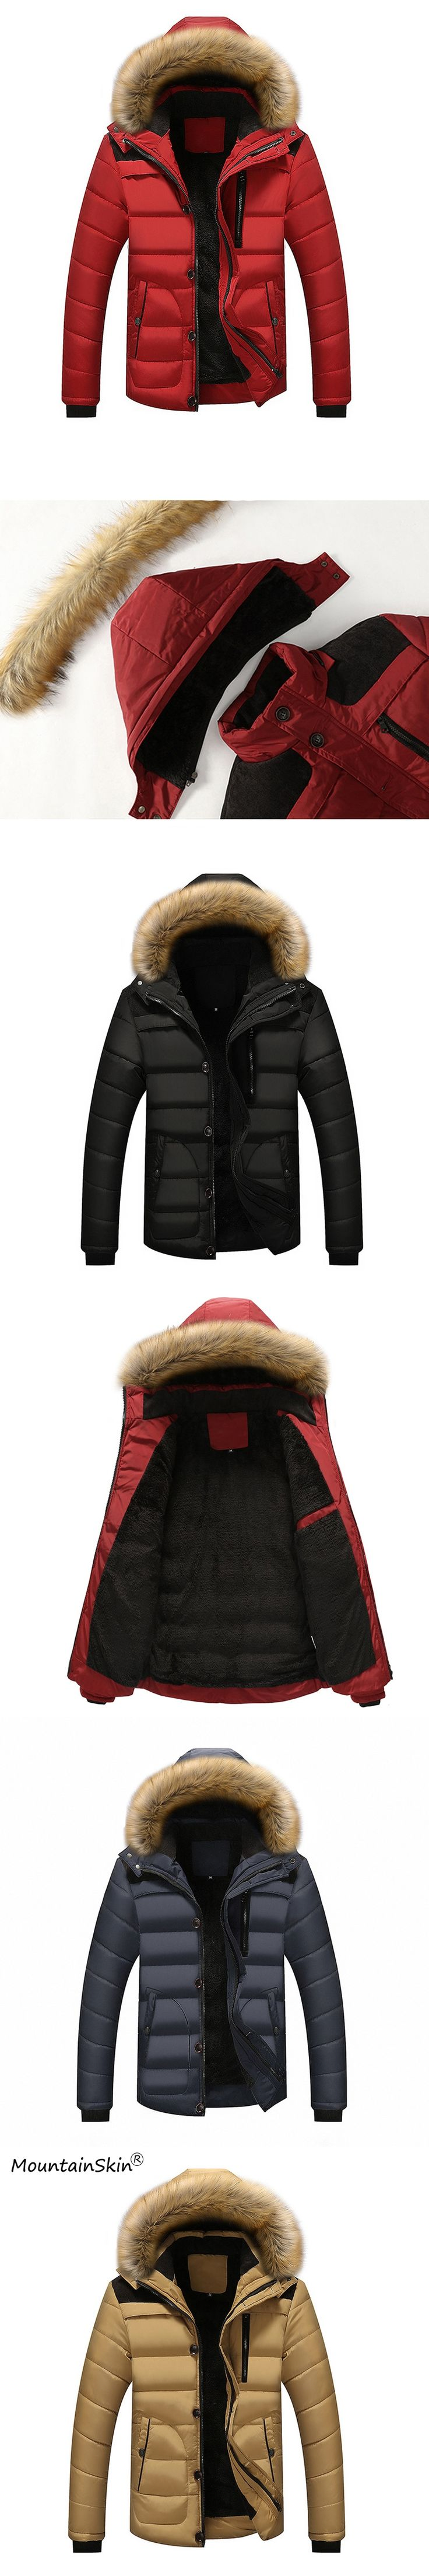 Mountainskin 5XL Men Winter Parkas Casual Fur Hooded Jackets Warm Fleece Parkas Male Fashion Thick Coats Brand Outerwears LA597